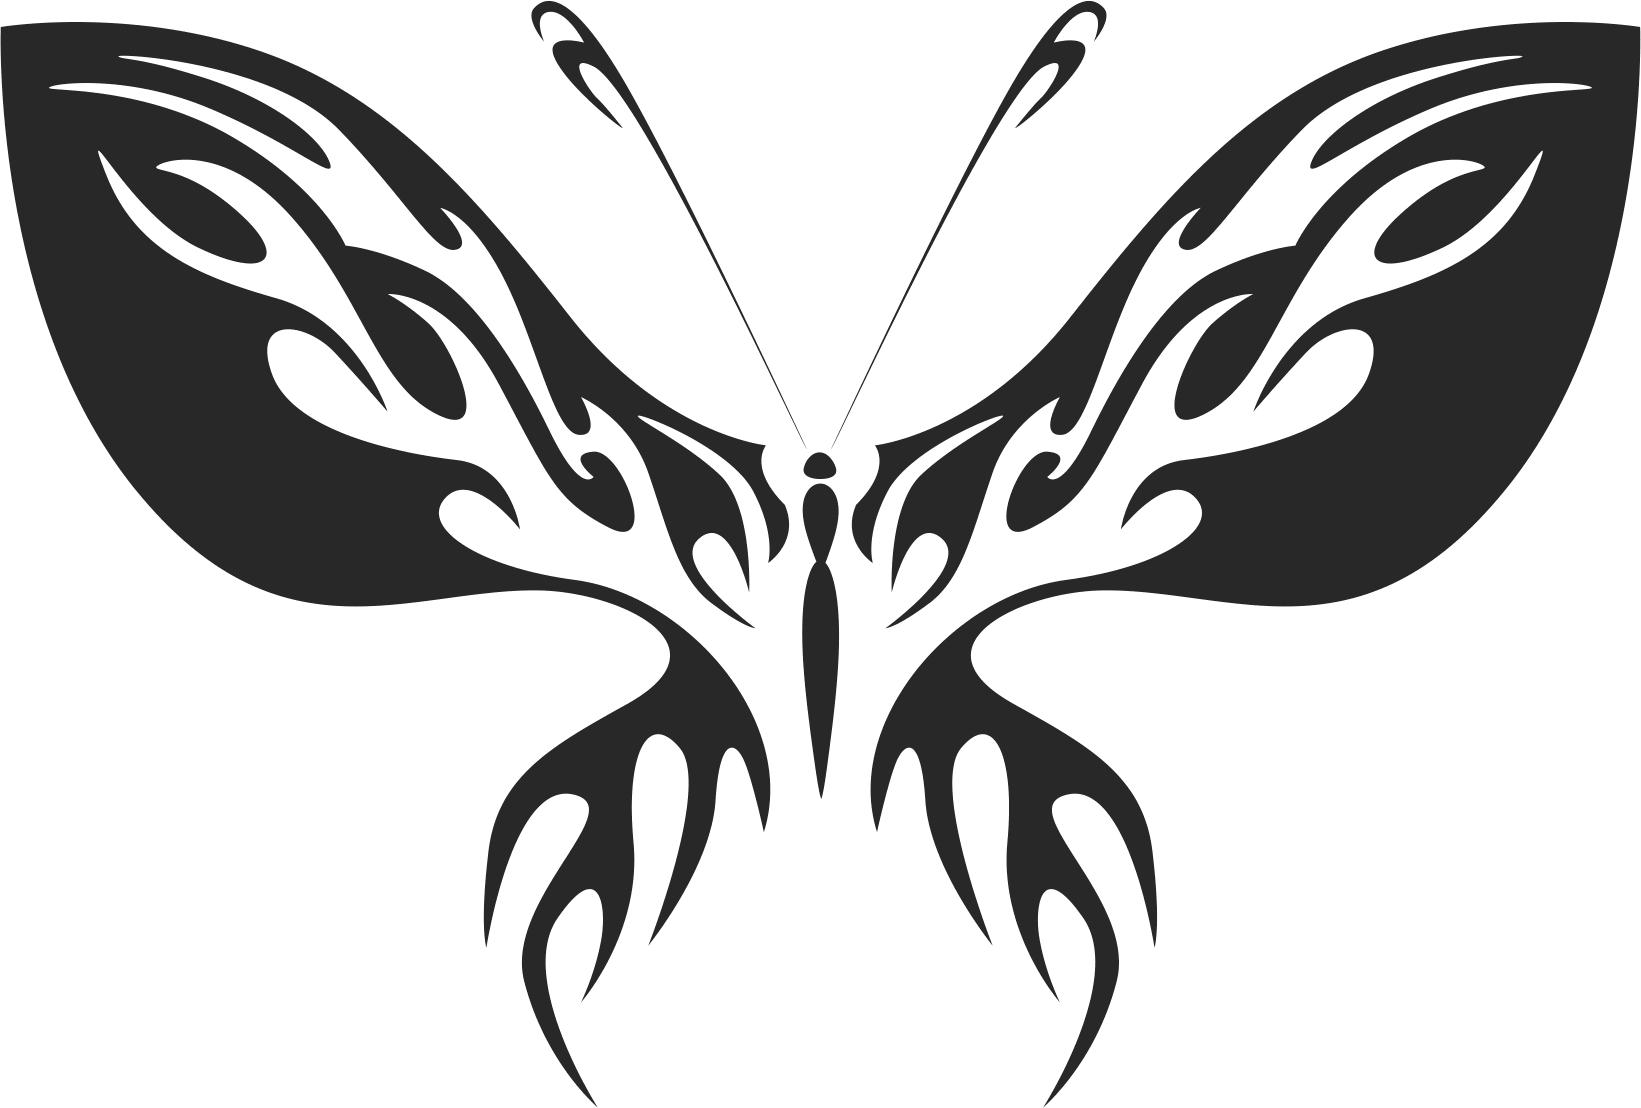 Butterfly Vector Art 013 Free CDR Vectors Art